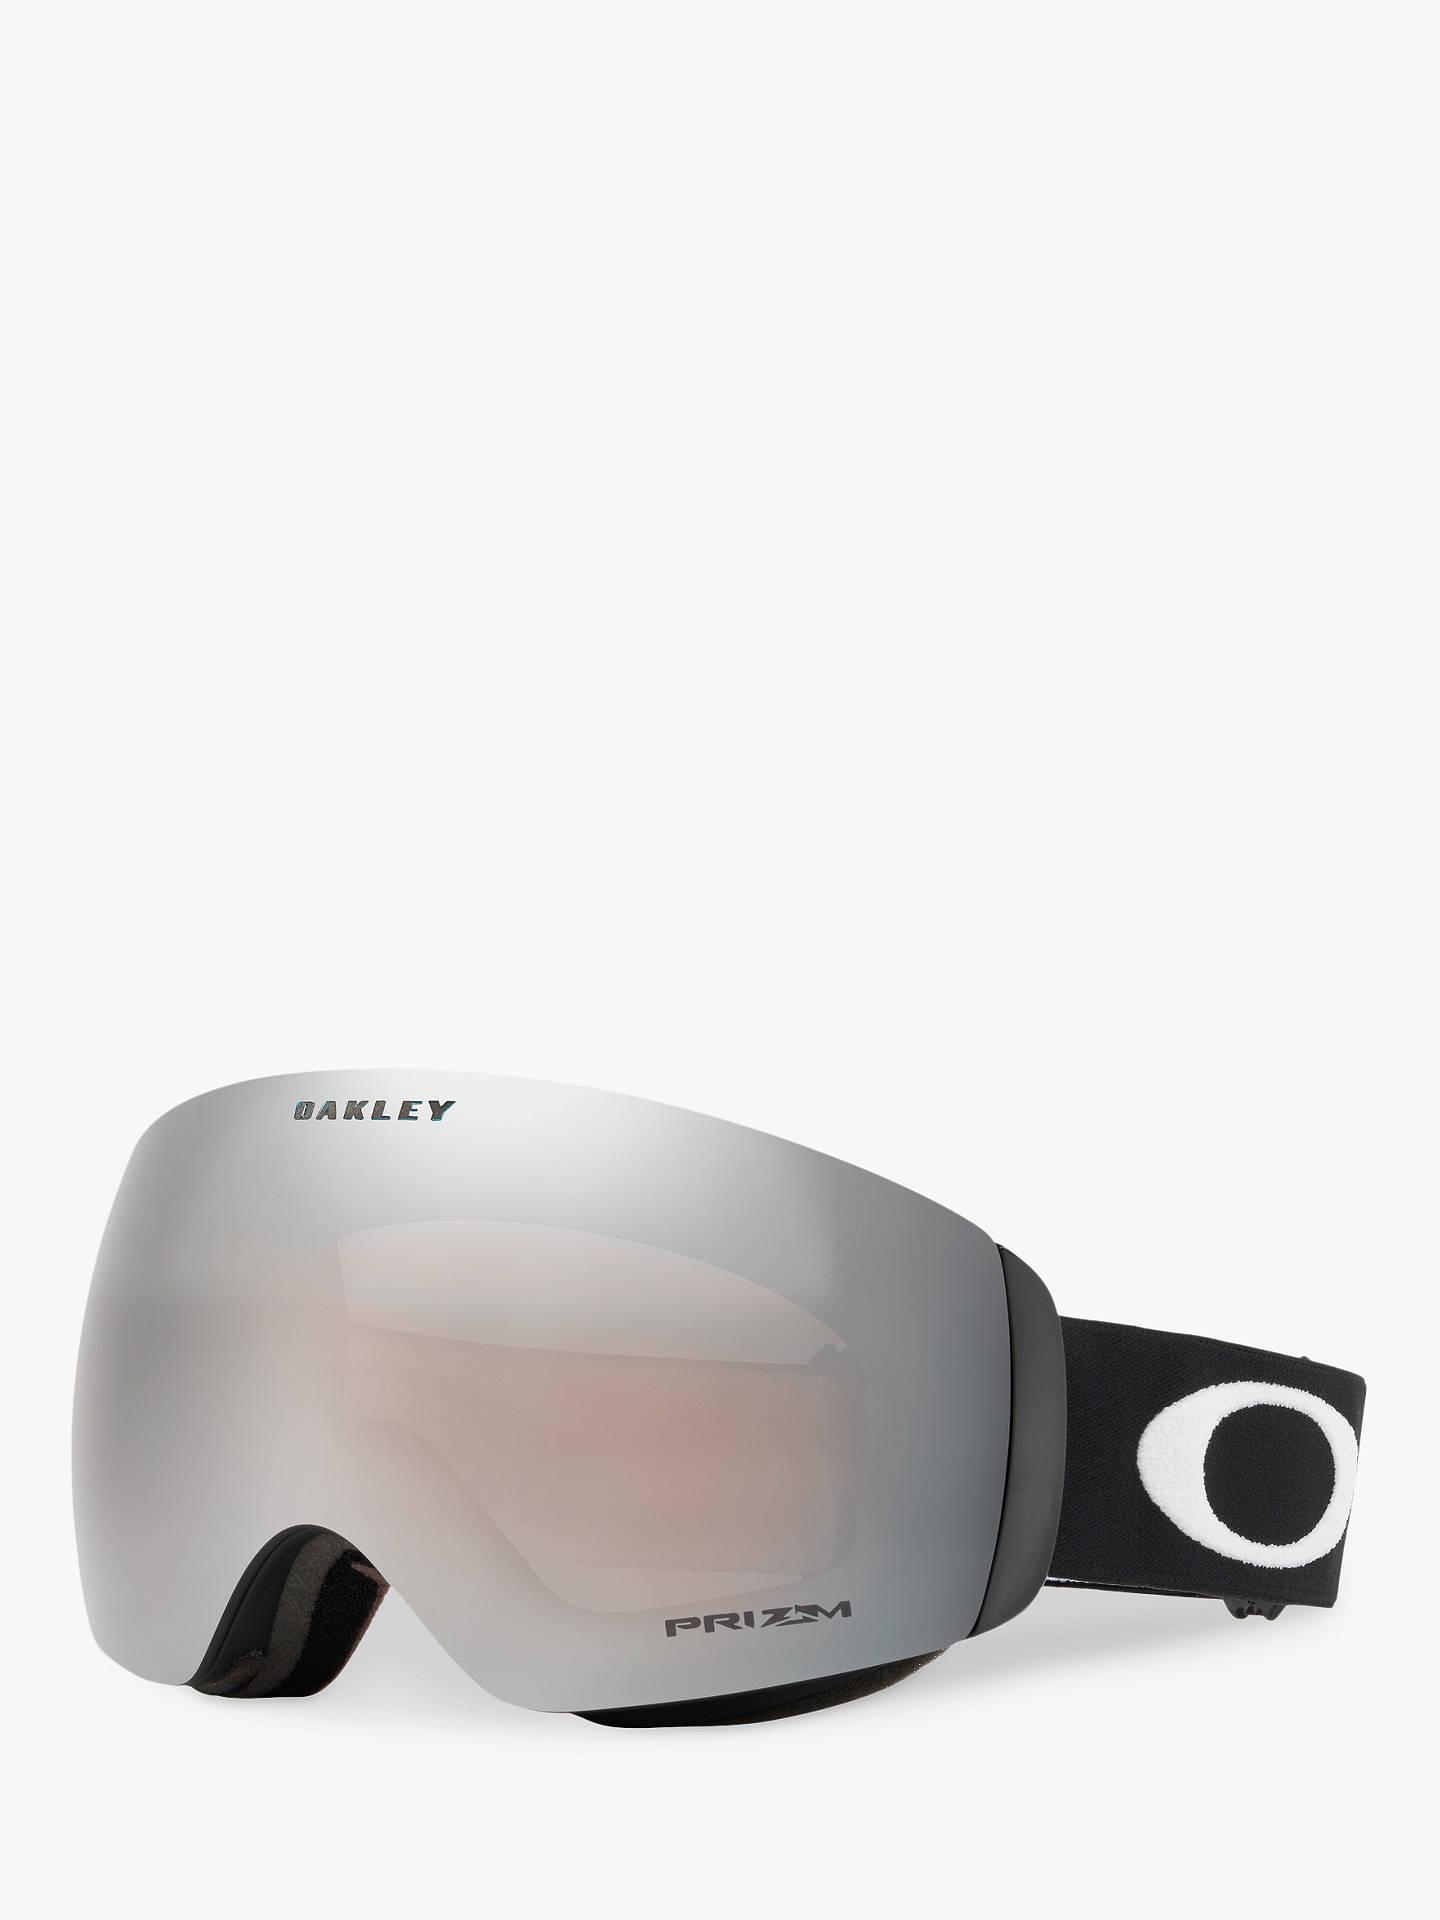 c3e57a519c5 Oakley OO7064 Unisex Flight Deck XM Prizm Ski Goggles at John Lewis ...